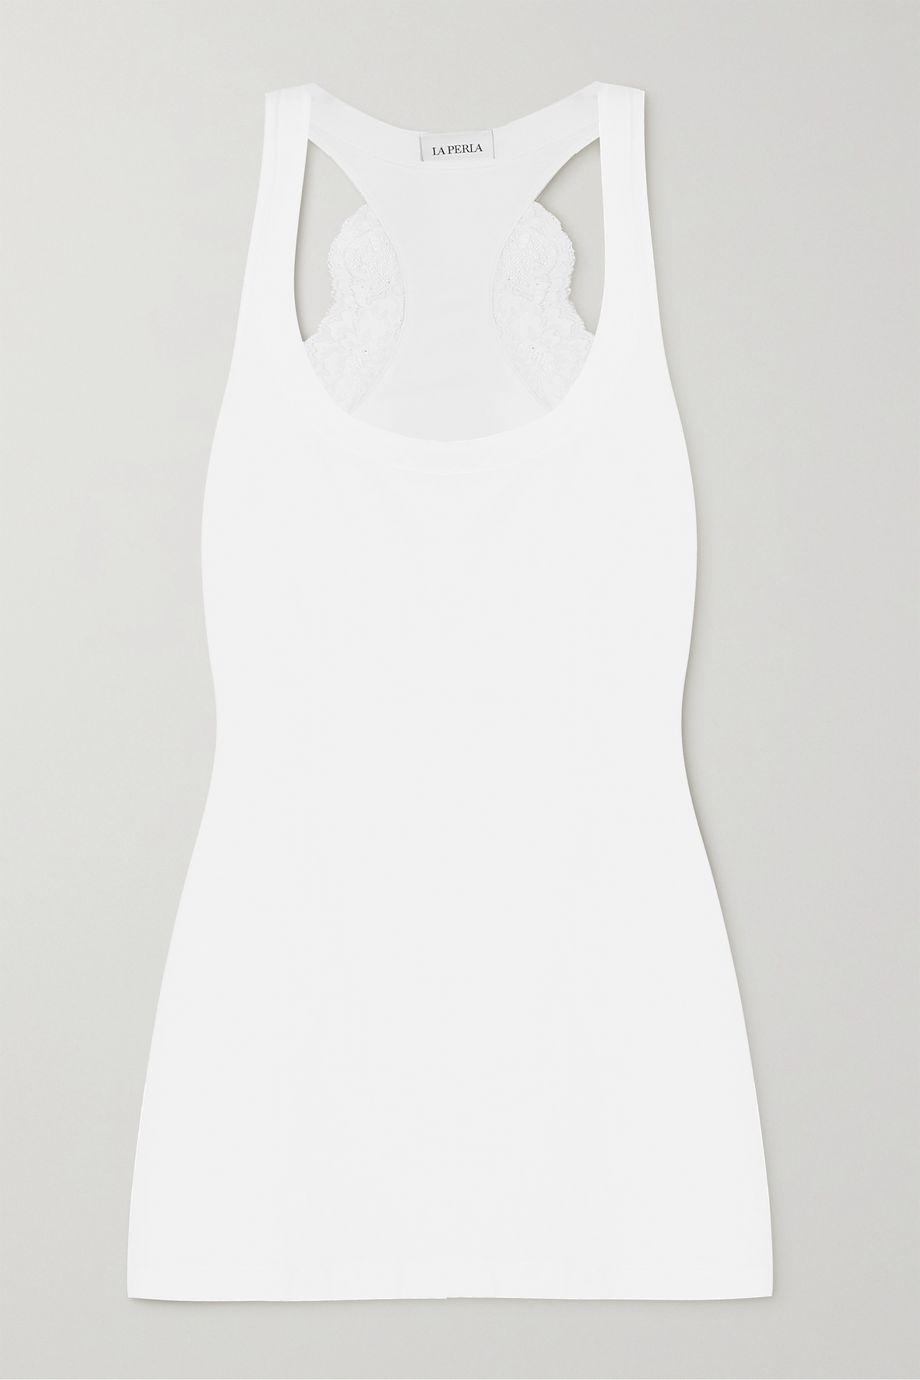 La Perla Souple 蕾丝边饰弹力棉质平纹针织睡衣上装